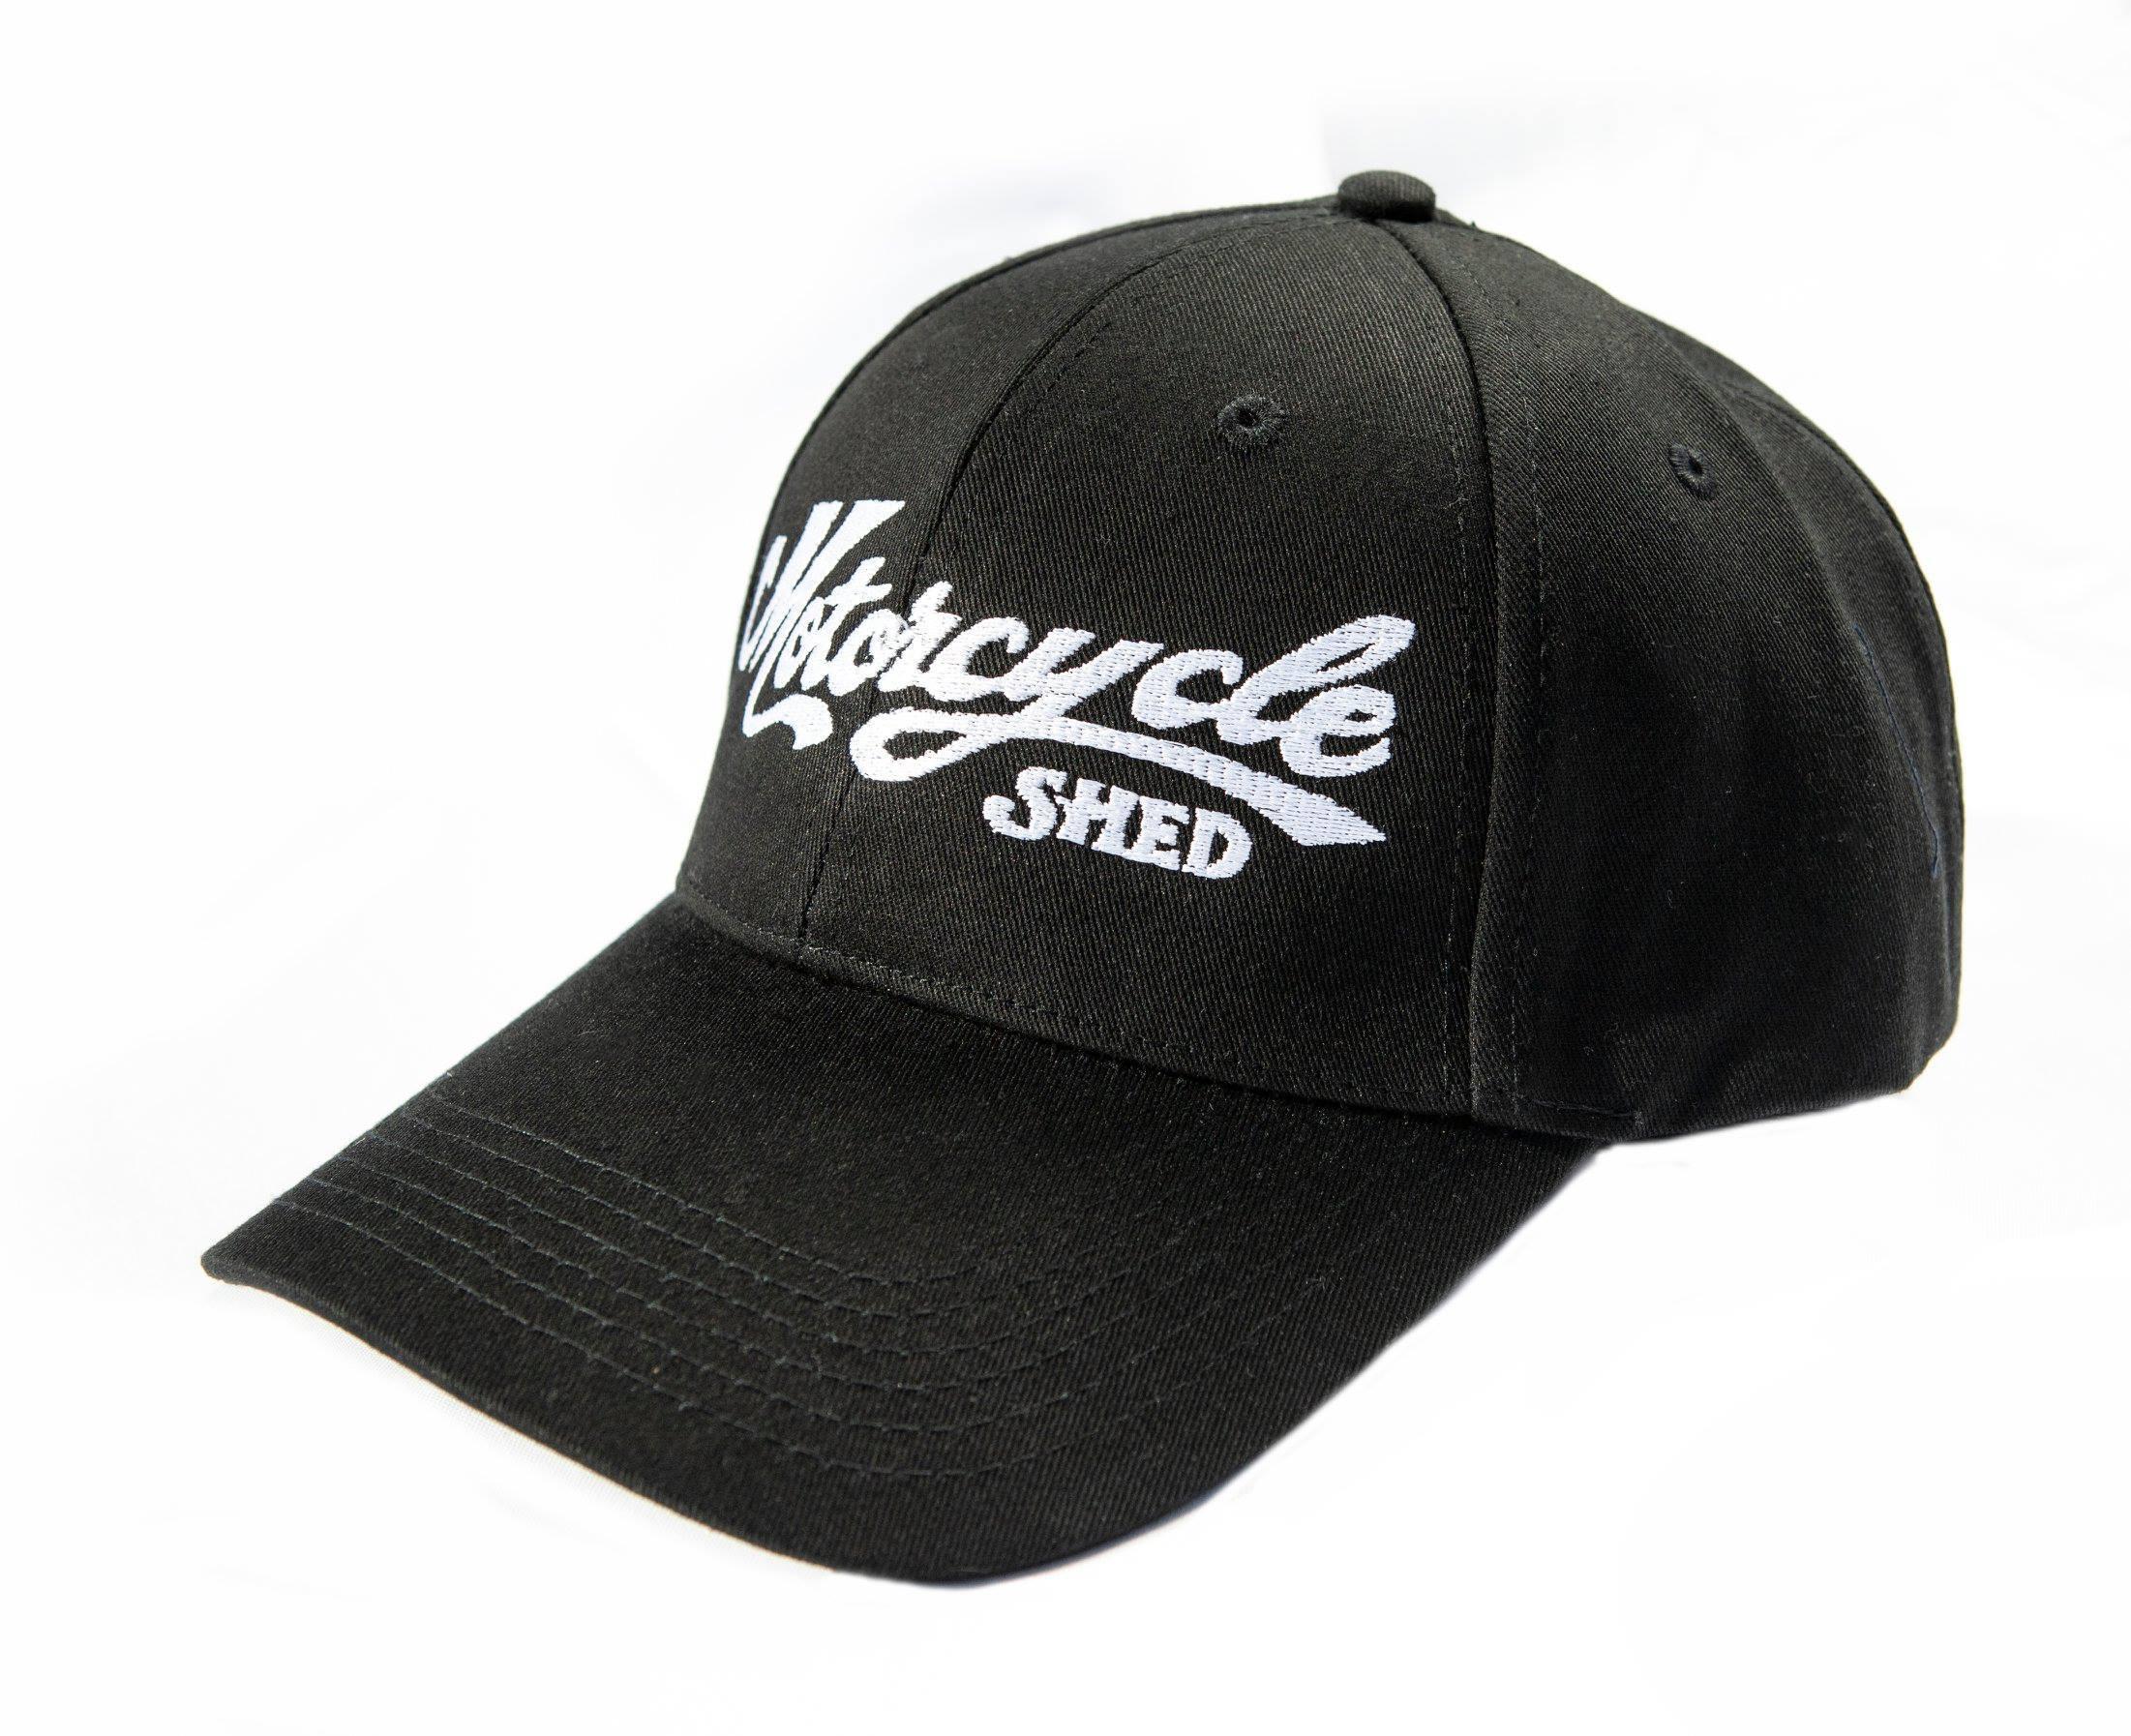 Motorcycle Shed Peak Cap - Cotton Back 00005